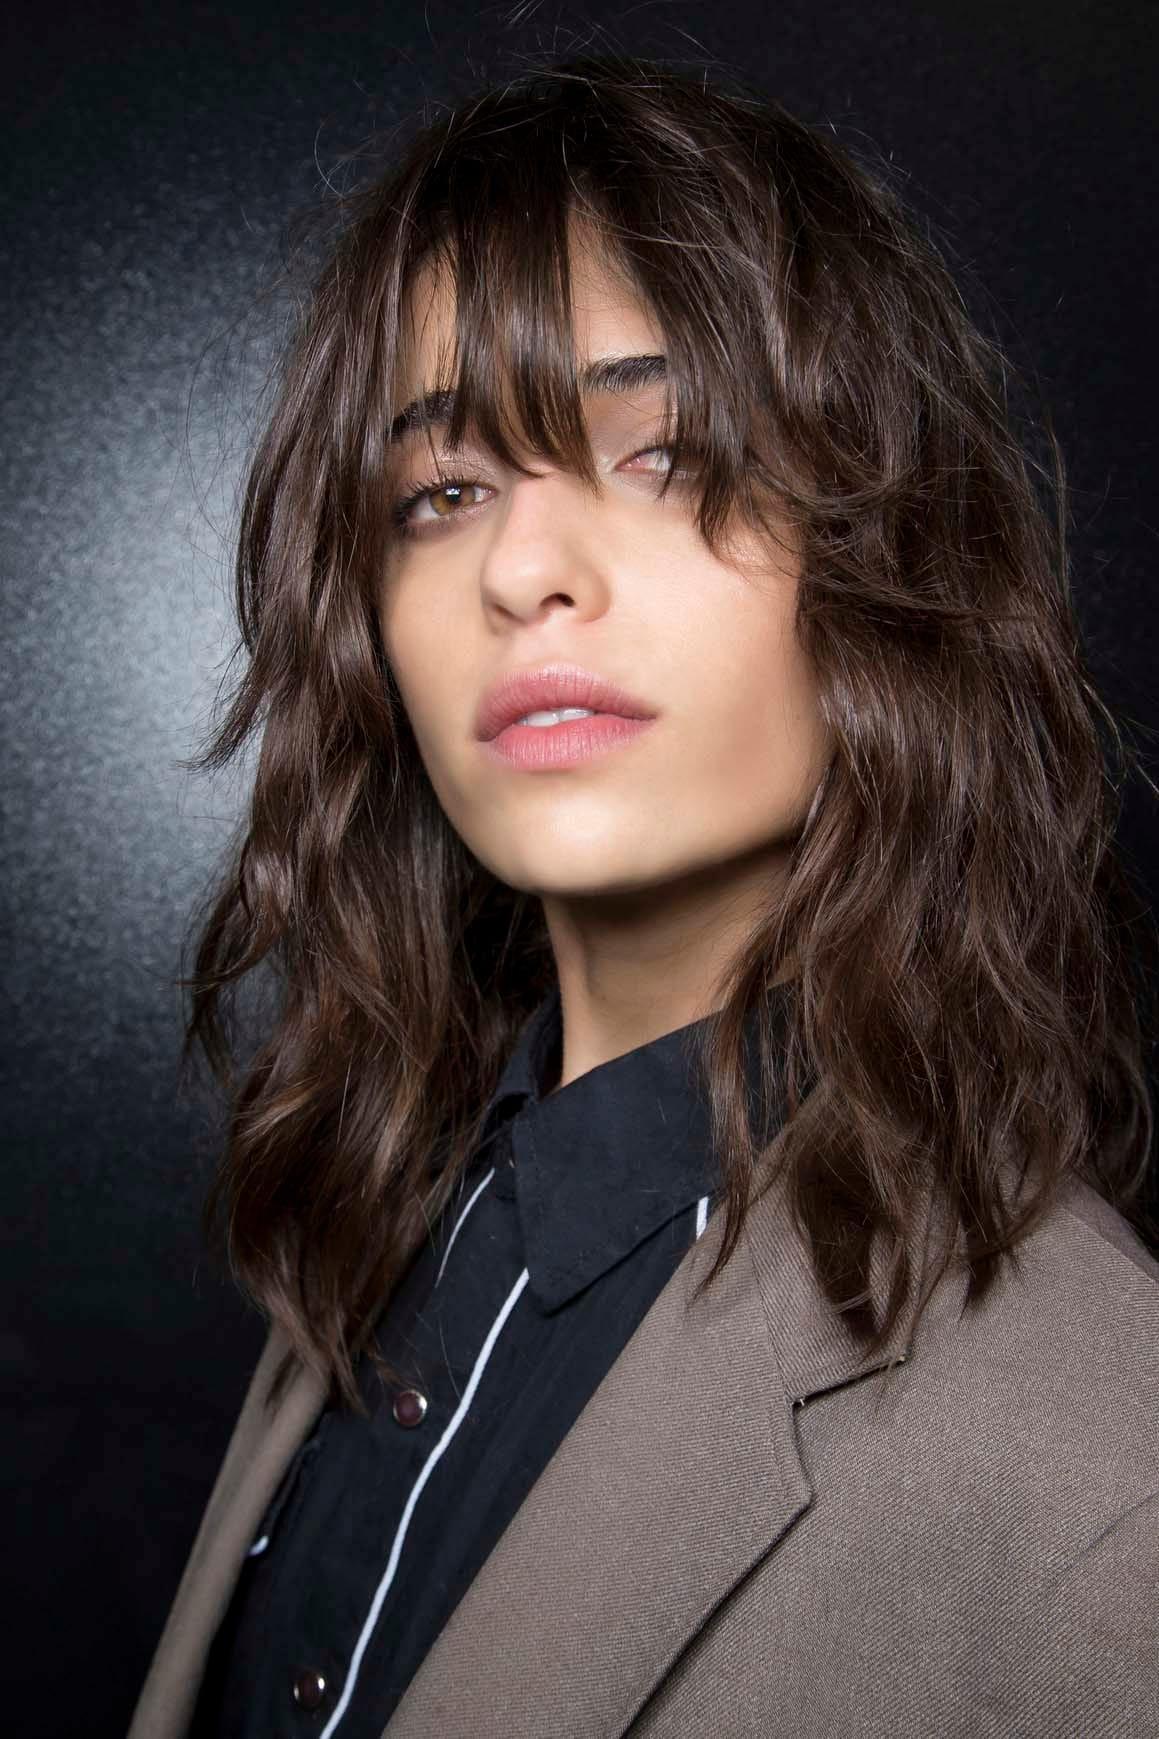 6. wanita kaukasia model rambut shaggy panjang dengan poni panjang